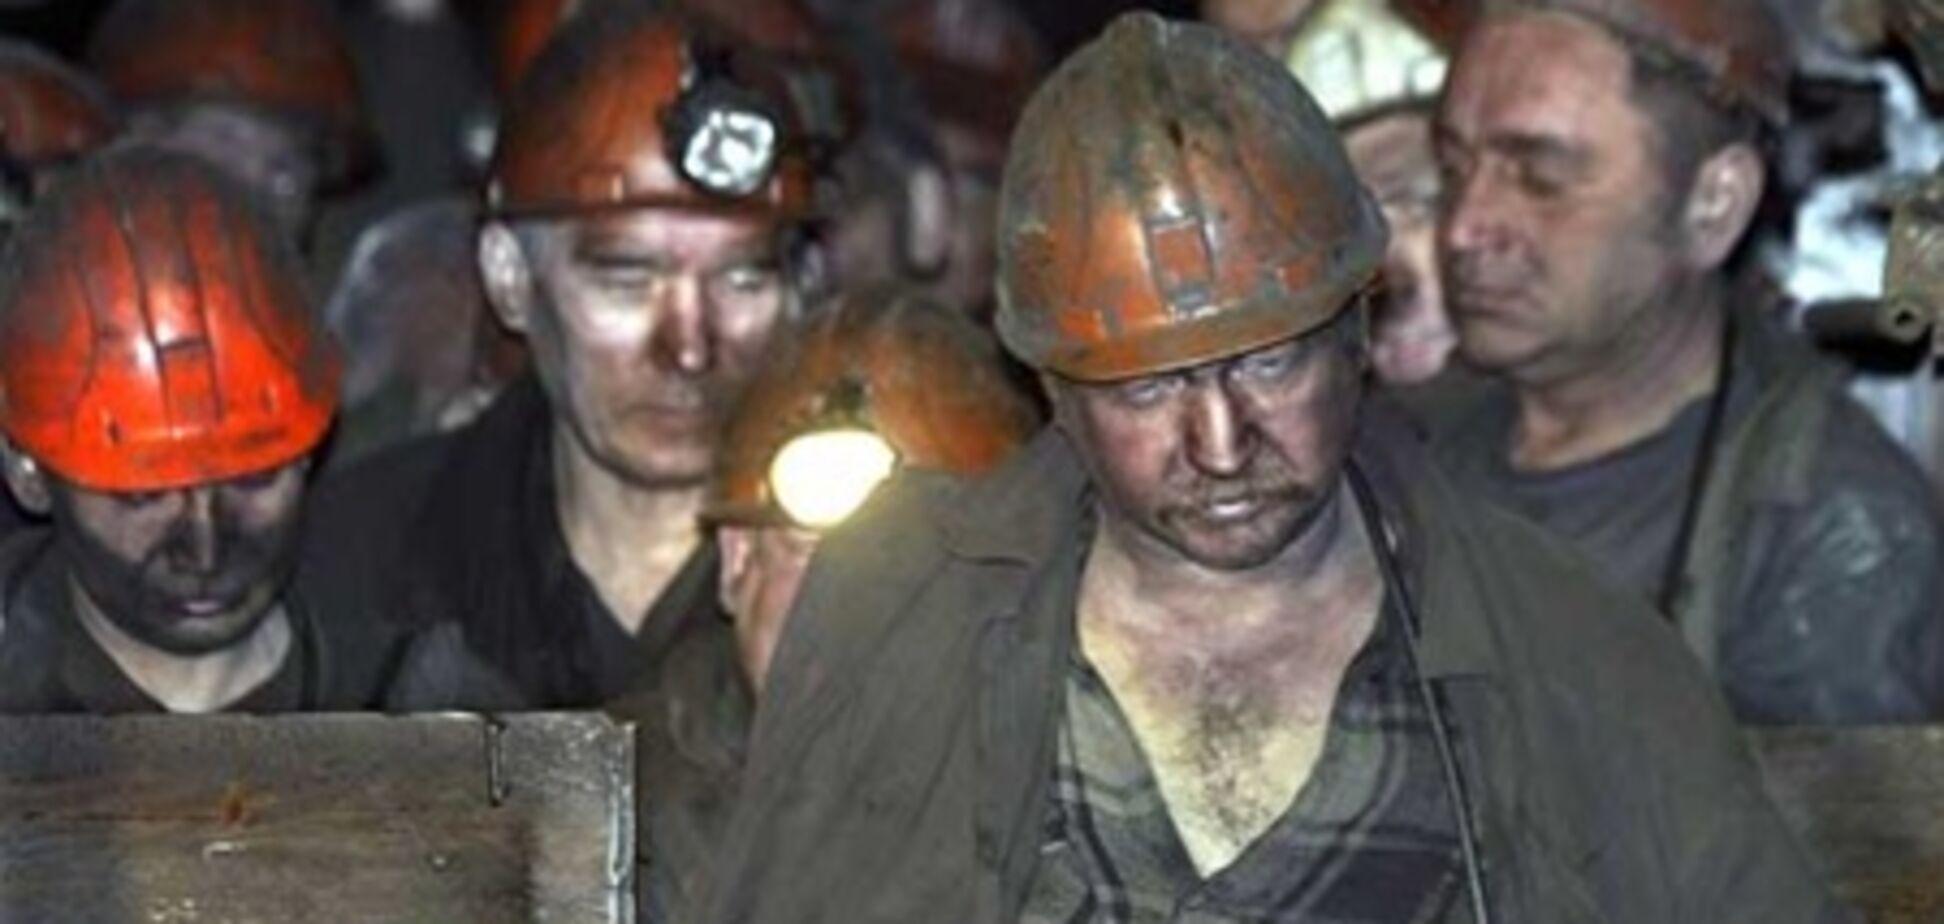 Луганские шахтеры выйдут на 72-дневную забастовку